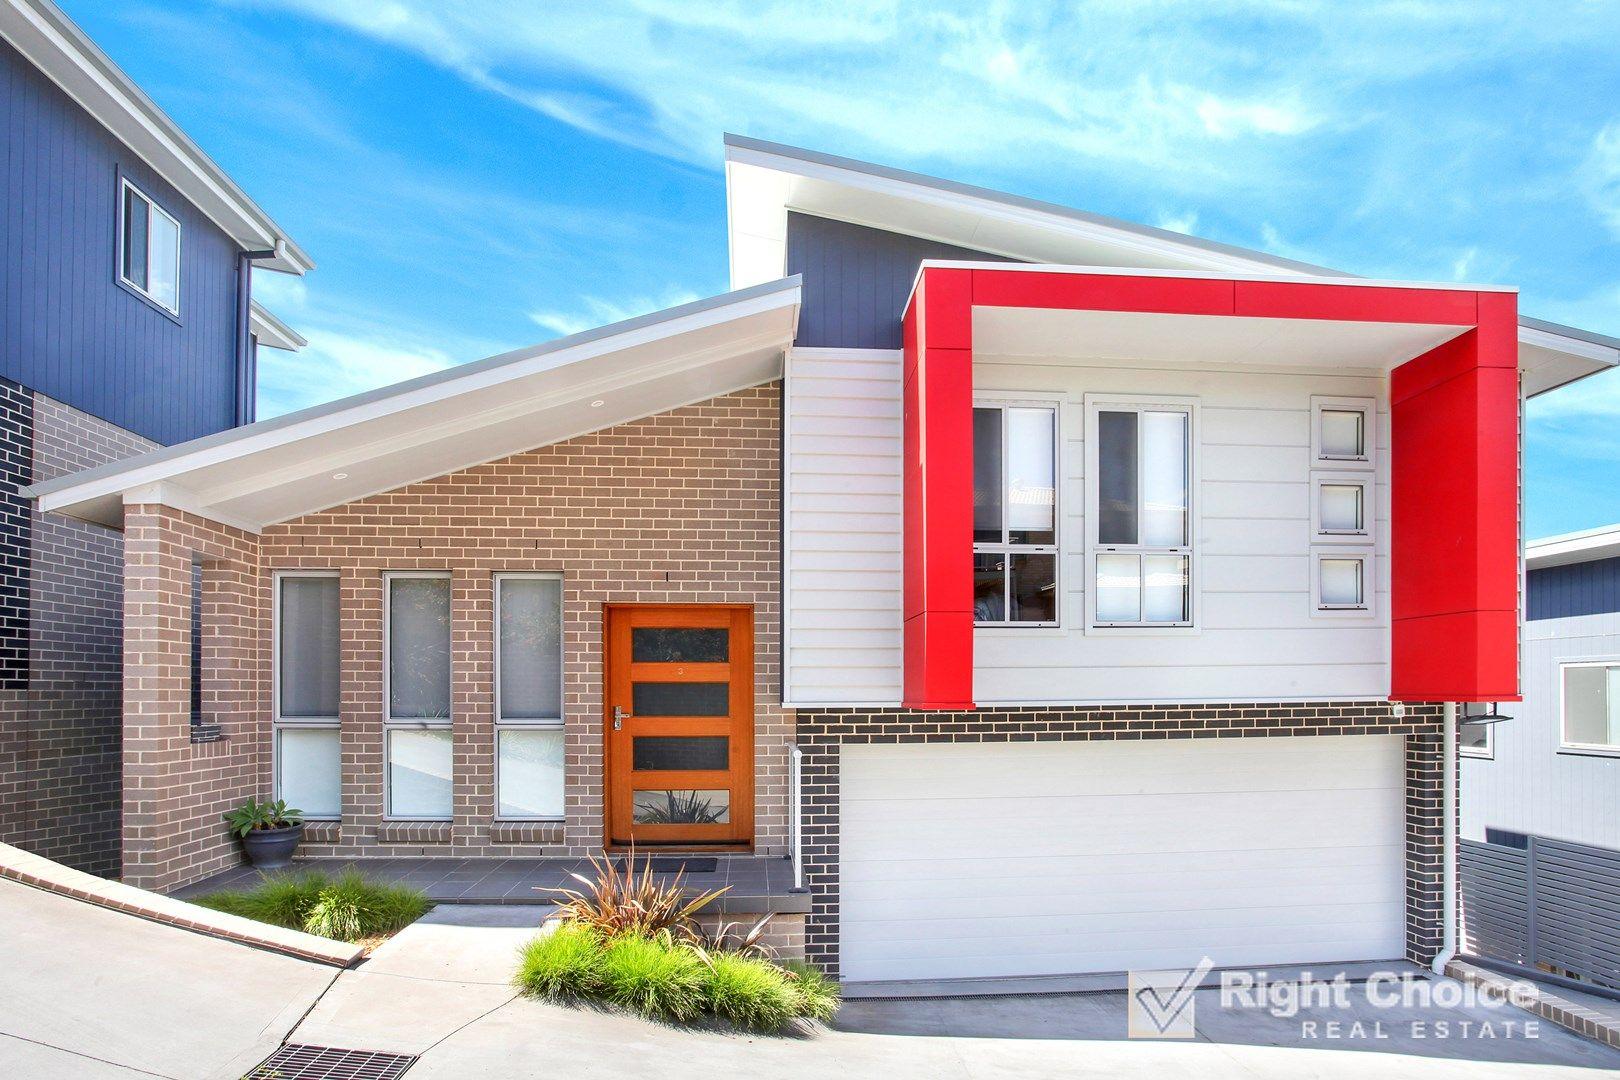 3/25 Yarle Crescent, Flinders NSW 2529, Image 0